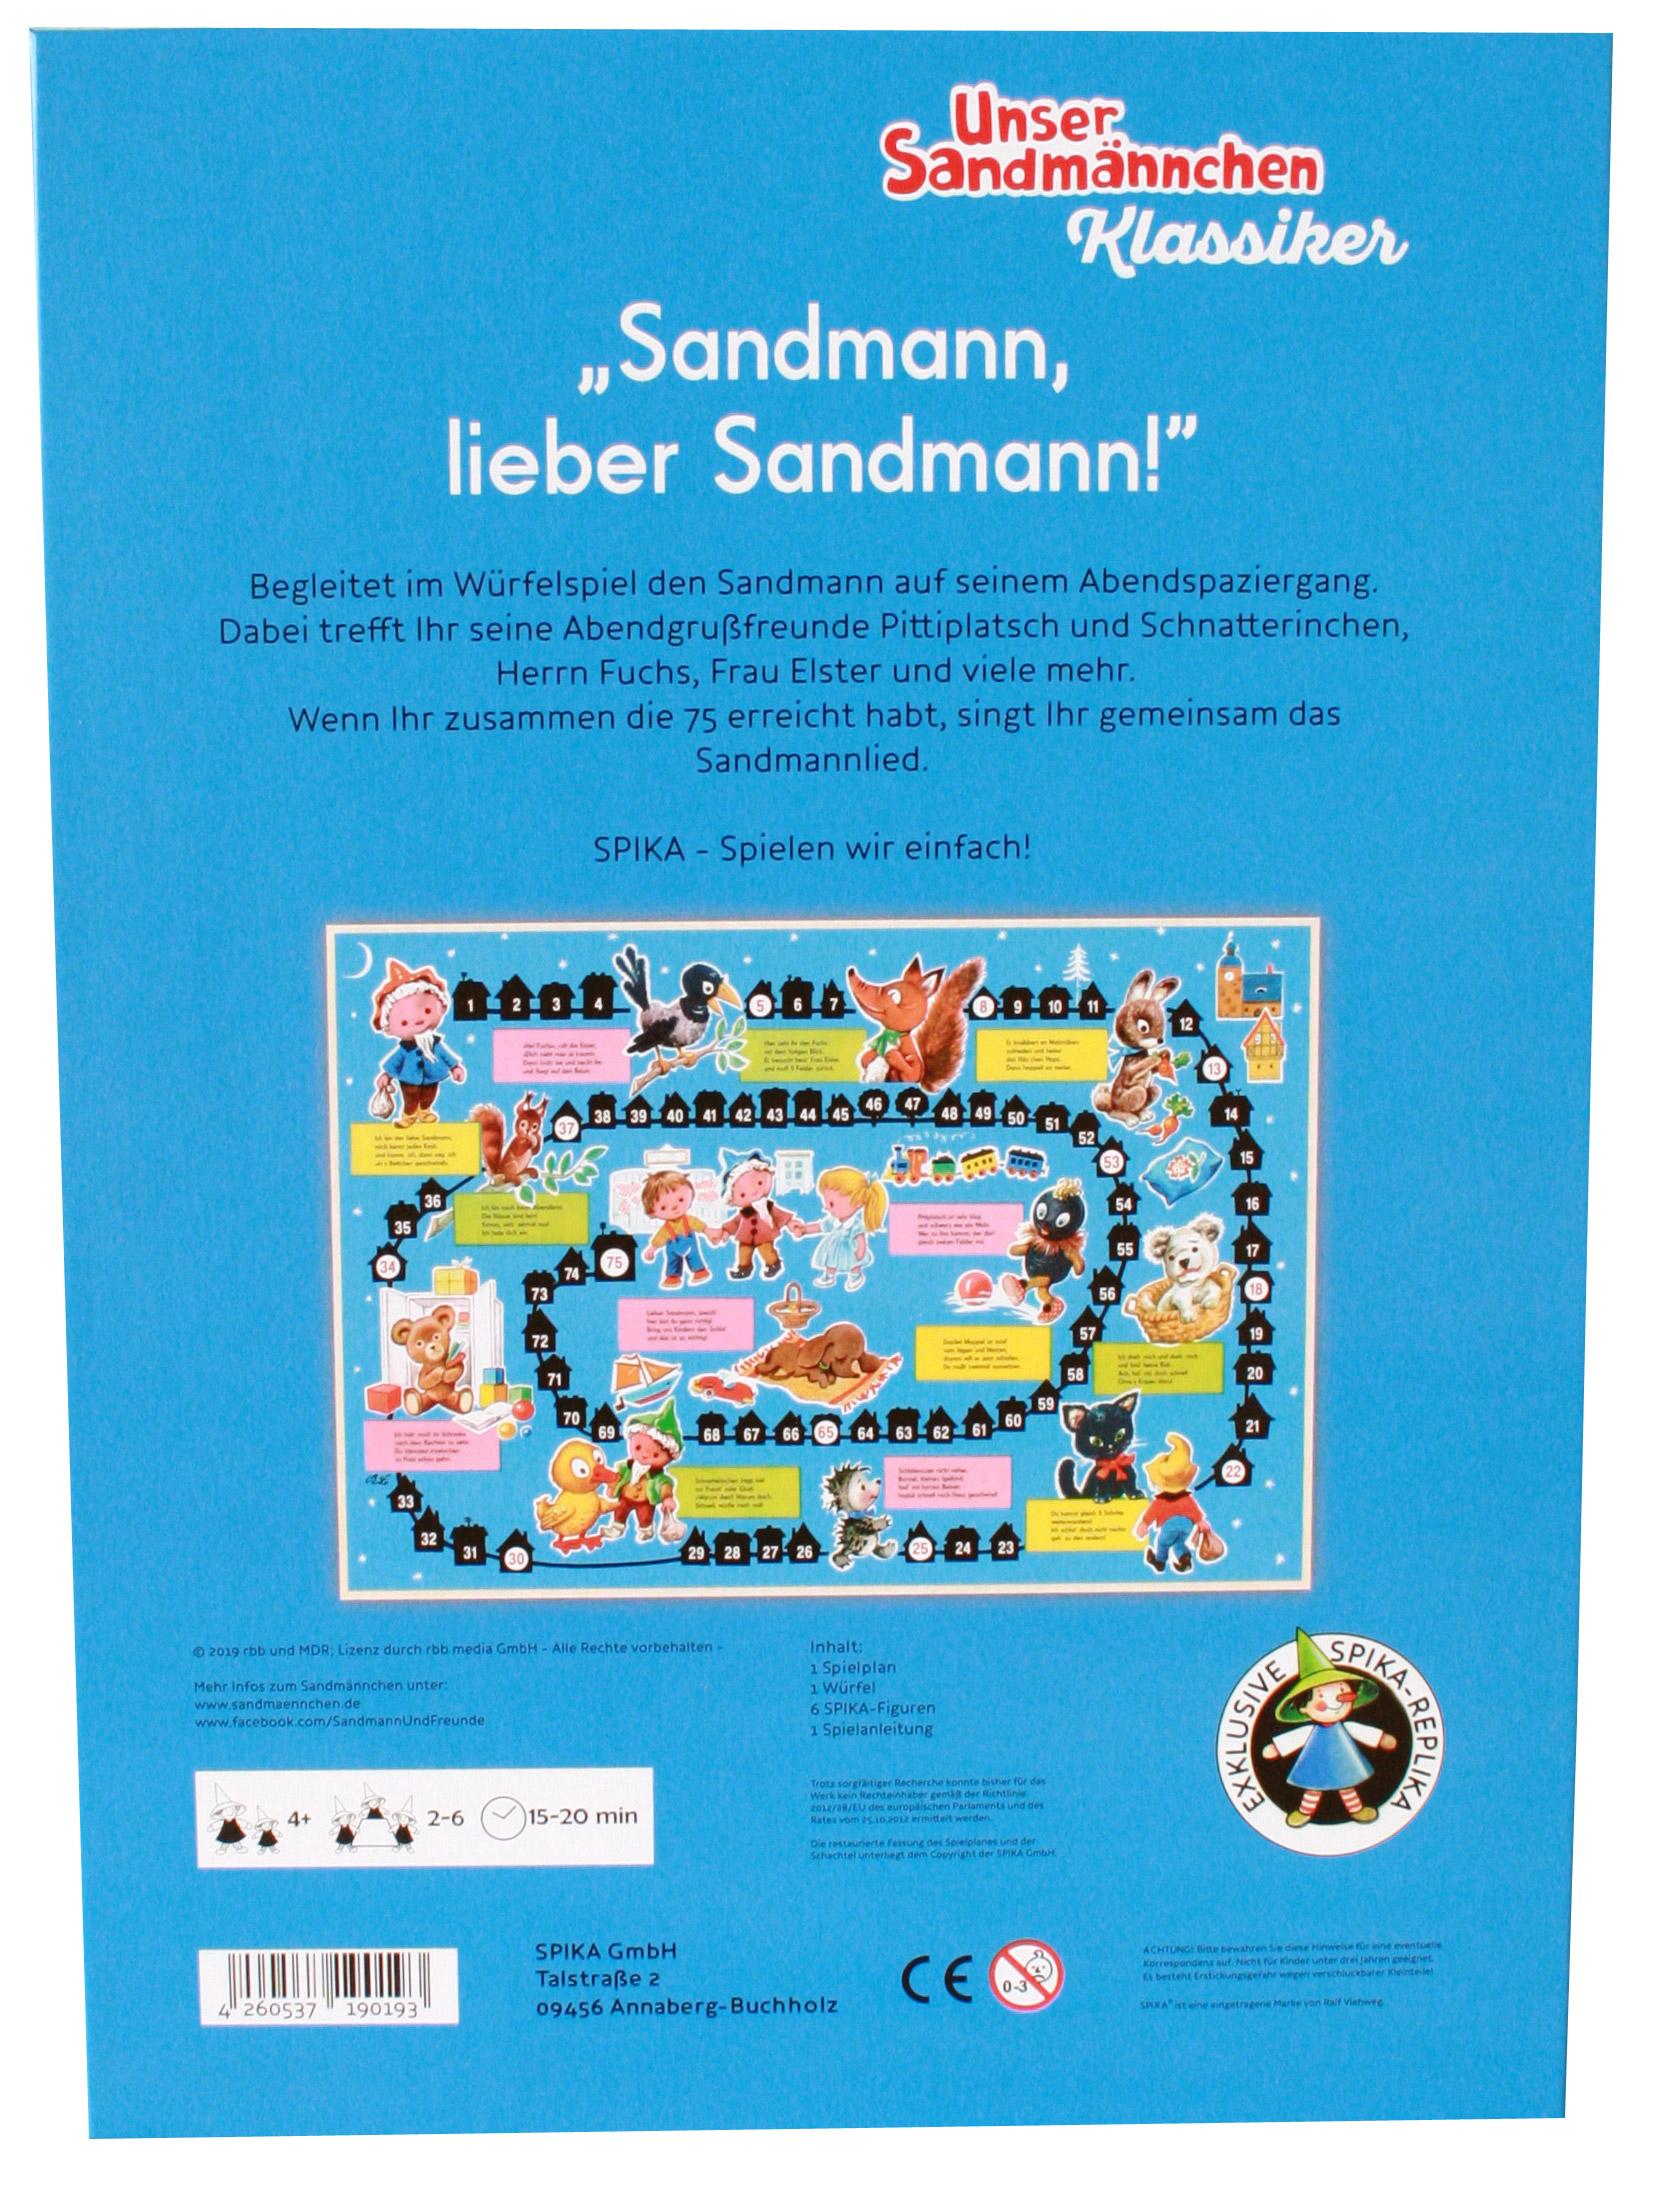 Sandmann, lieber Sandmann XXL